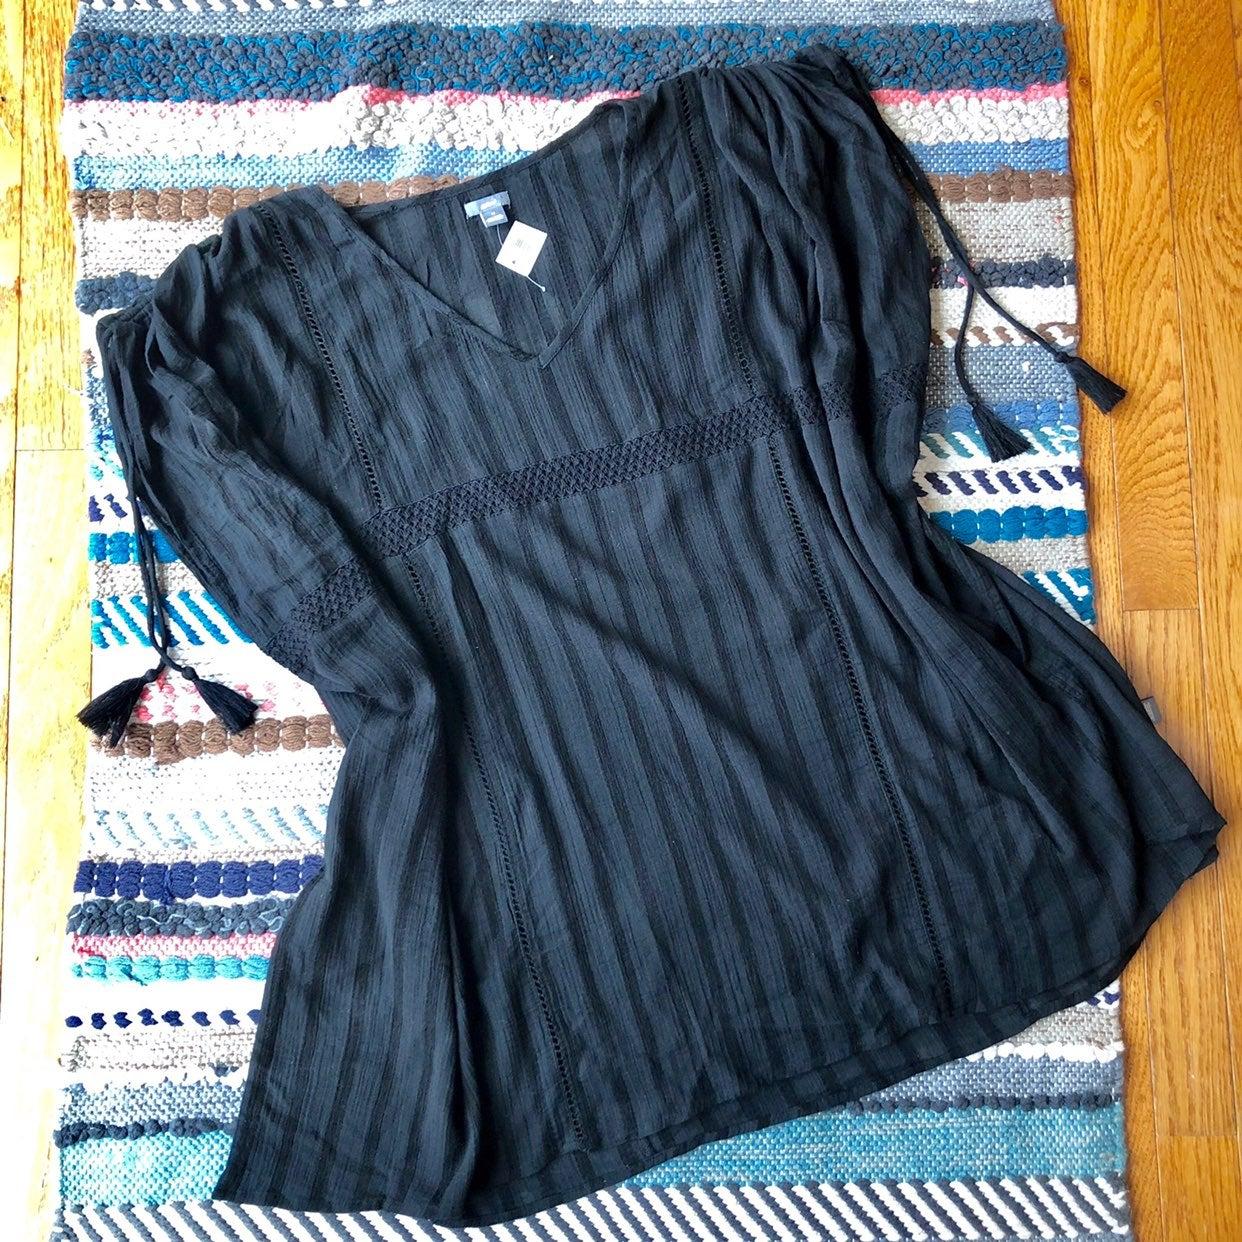 NWT Aerie Black Tassel Lace Coverup